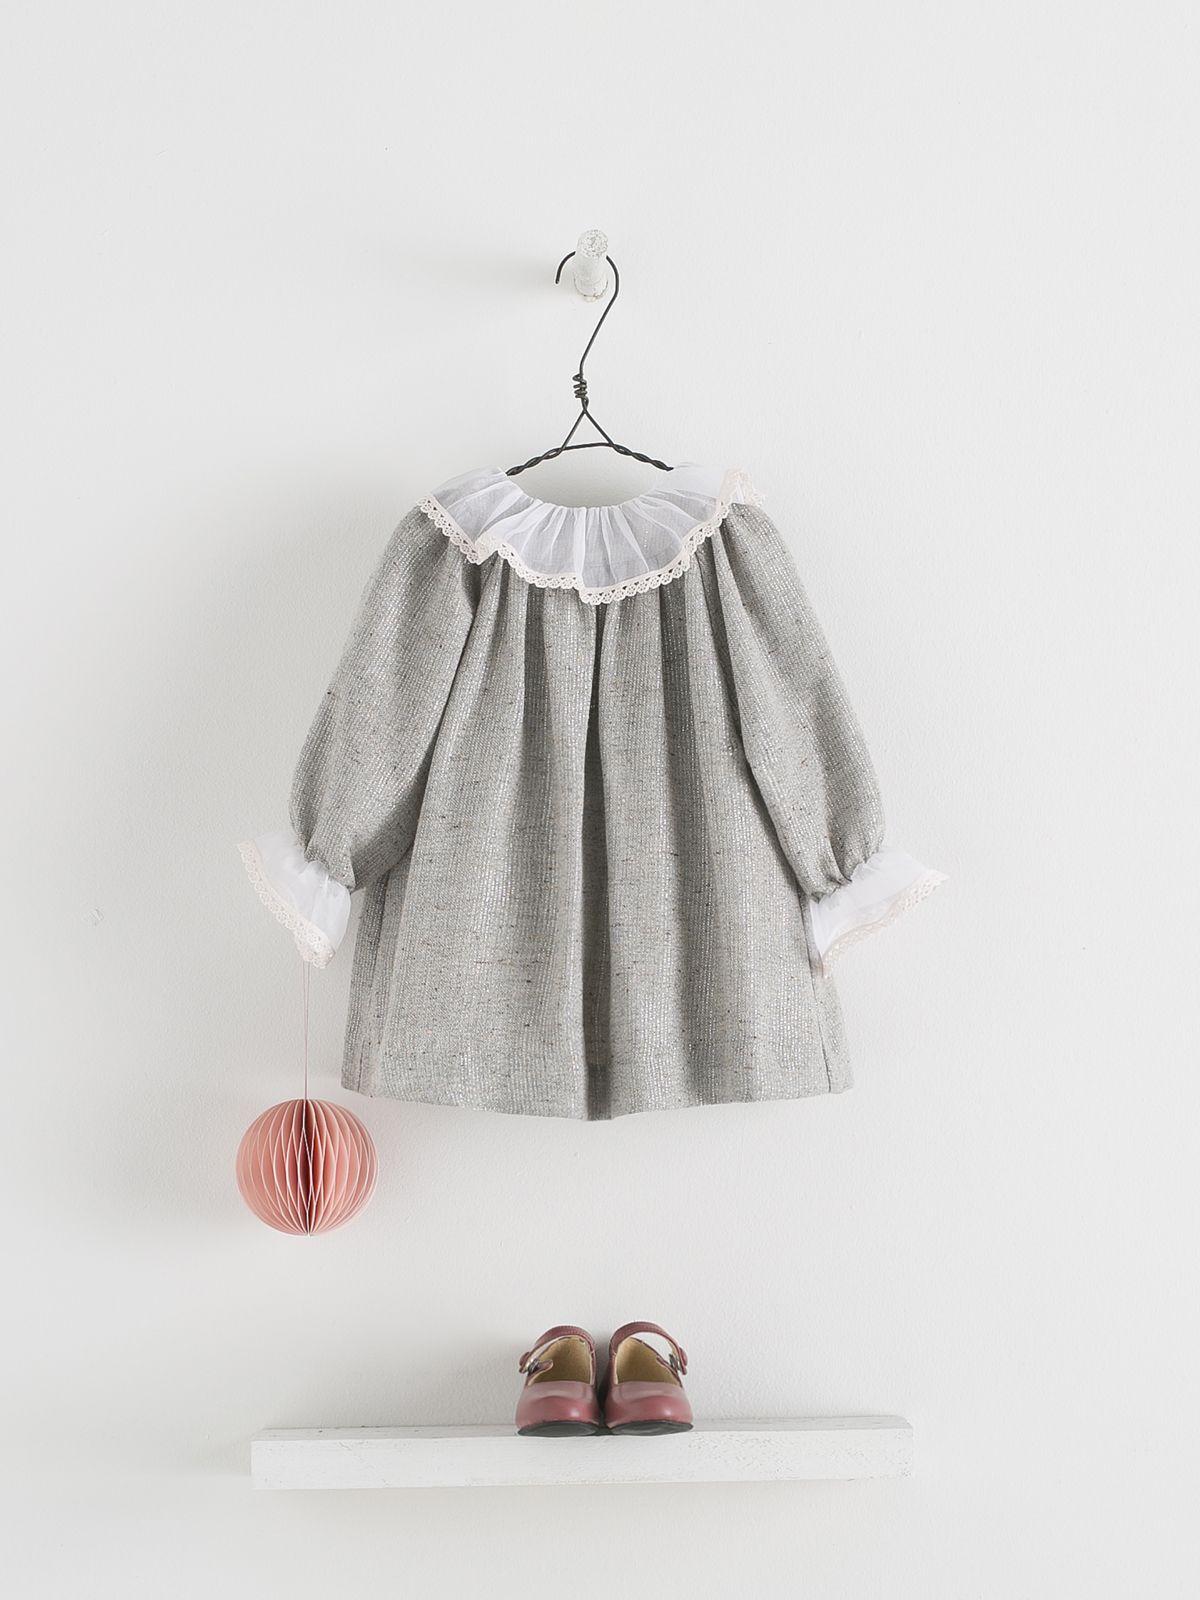 Buy Kids Clothes Onl - November 30 2018 at 11 26PM  e69383b43cb48